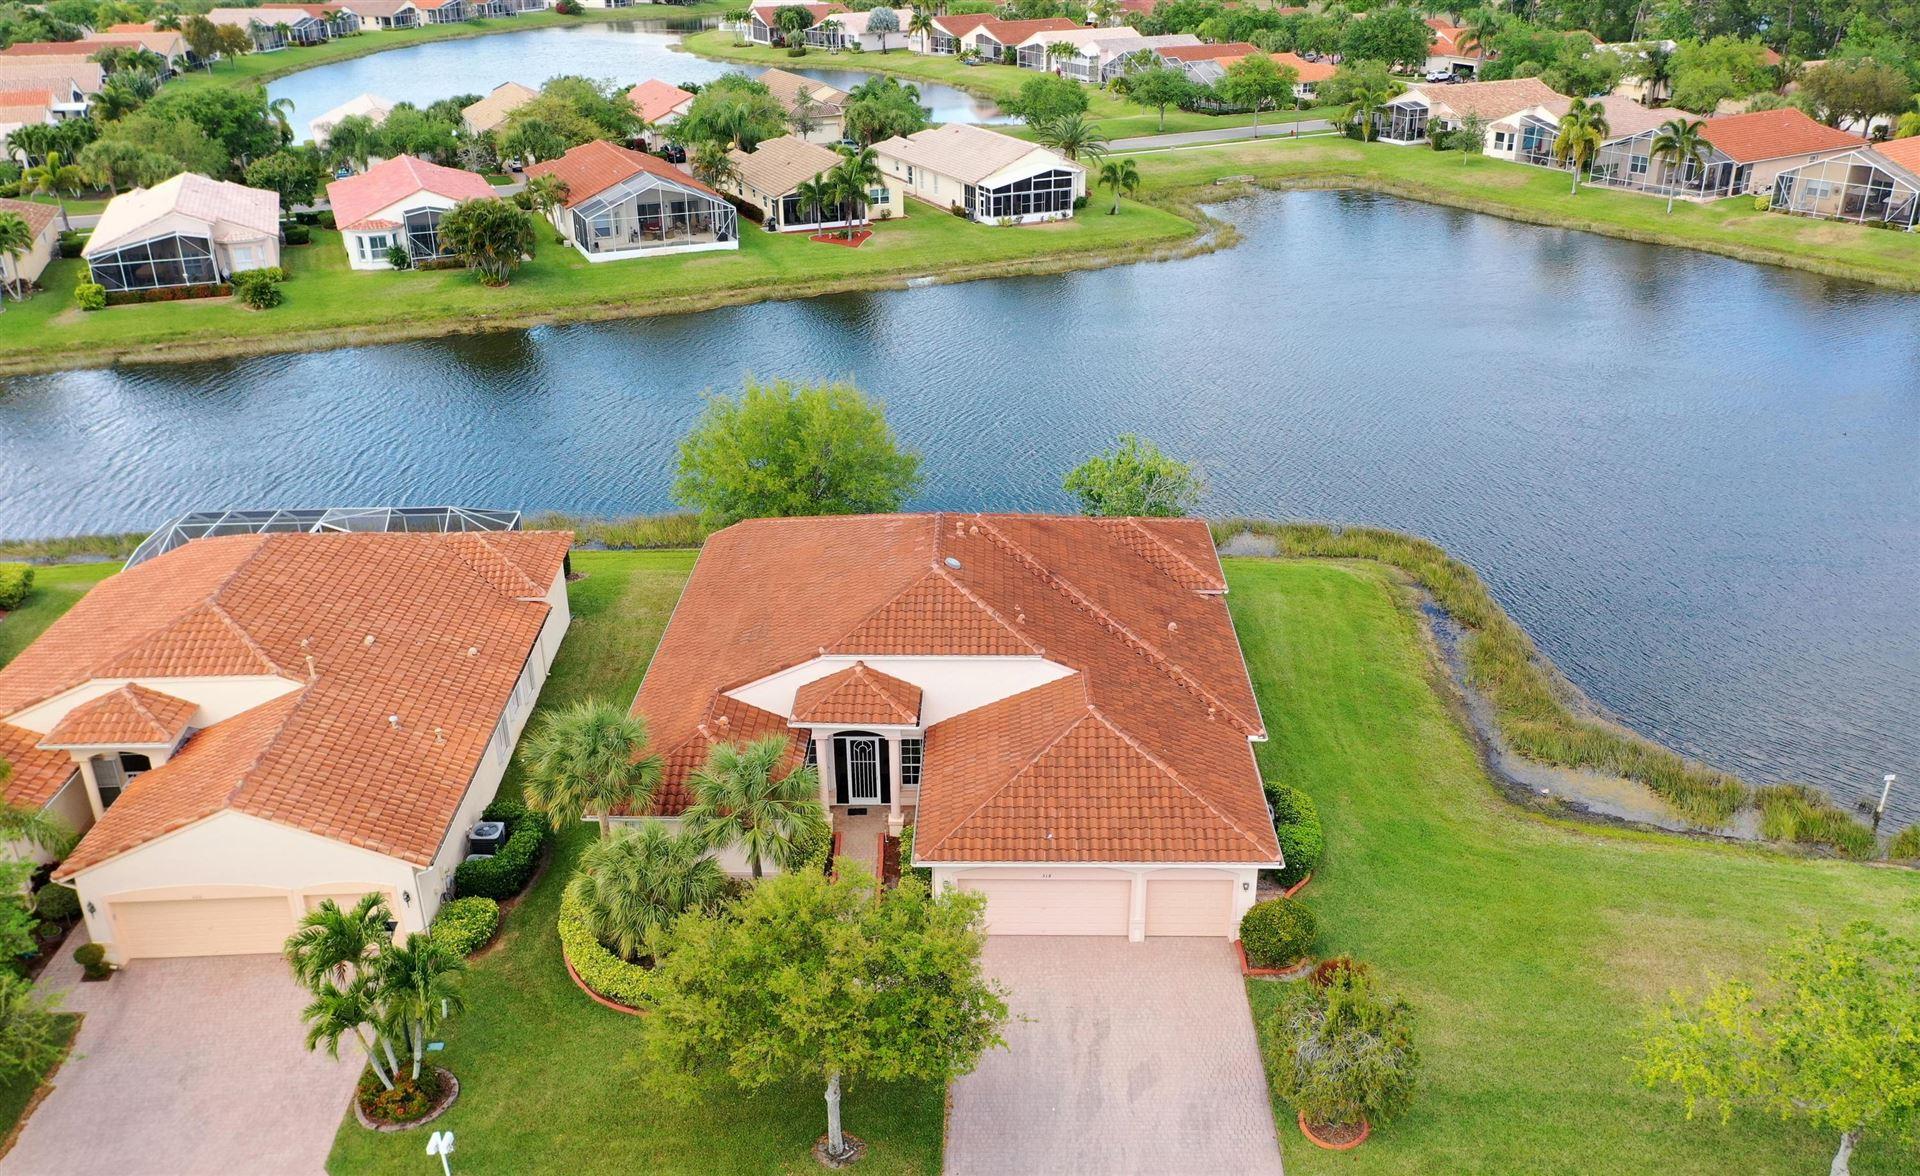 Photo of 518 NW Blue Lake Drive, Port Saint Lucie, FL 34986 (MLS # RX-10612248)